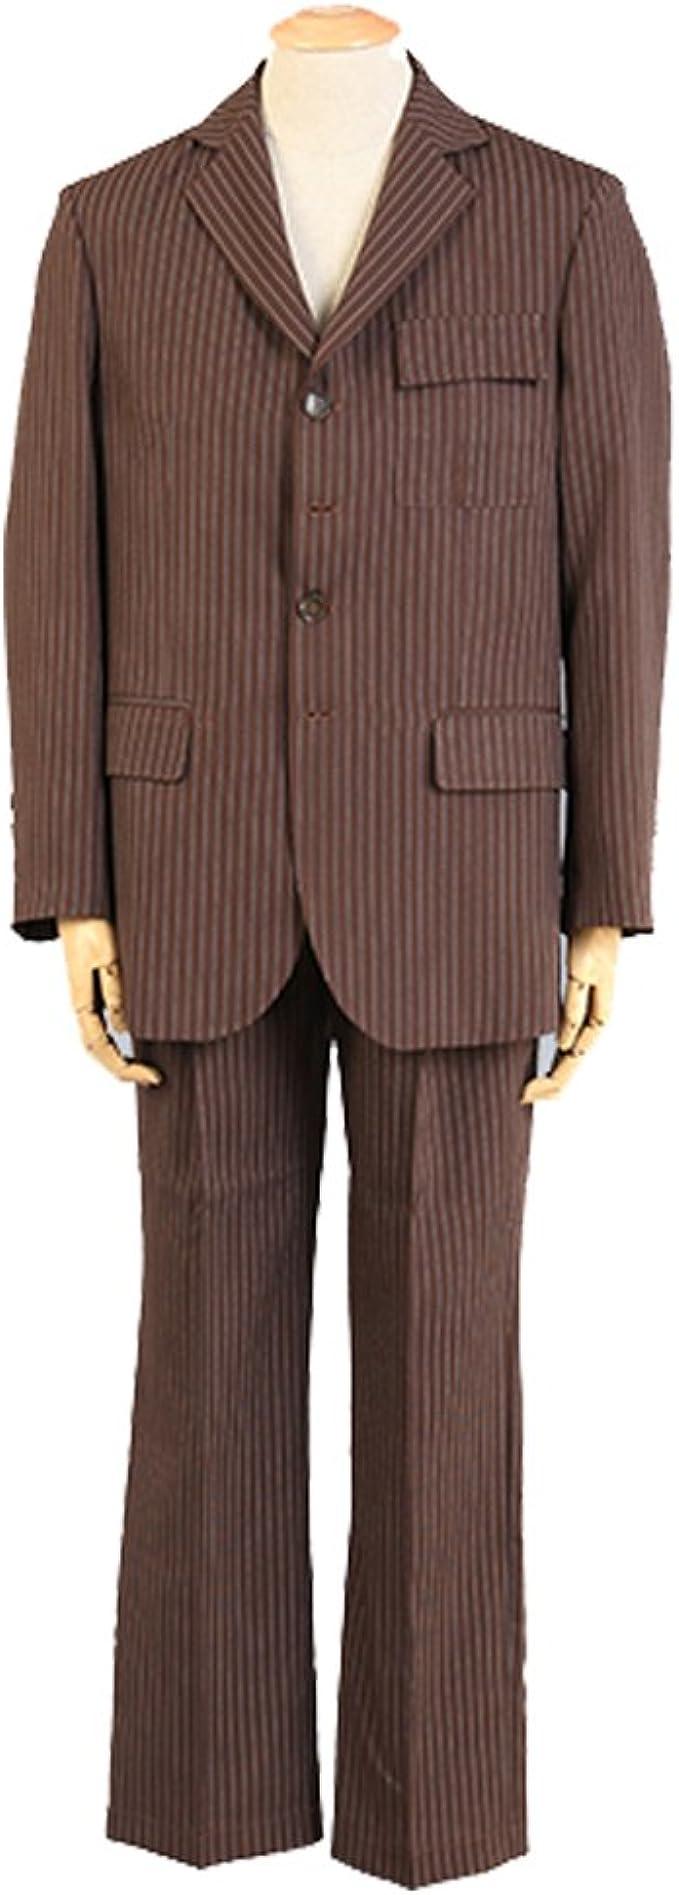 YZHEN Mens 2 Piece Gray Dress Suit Set